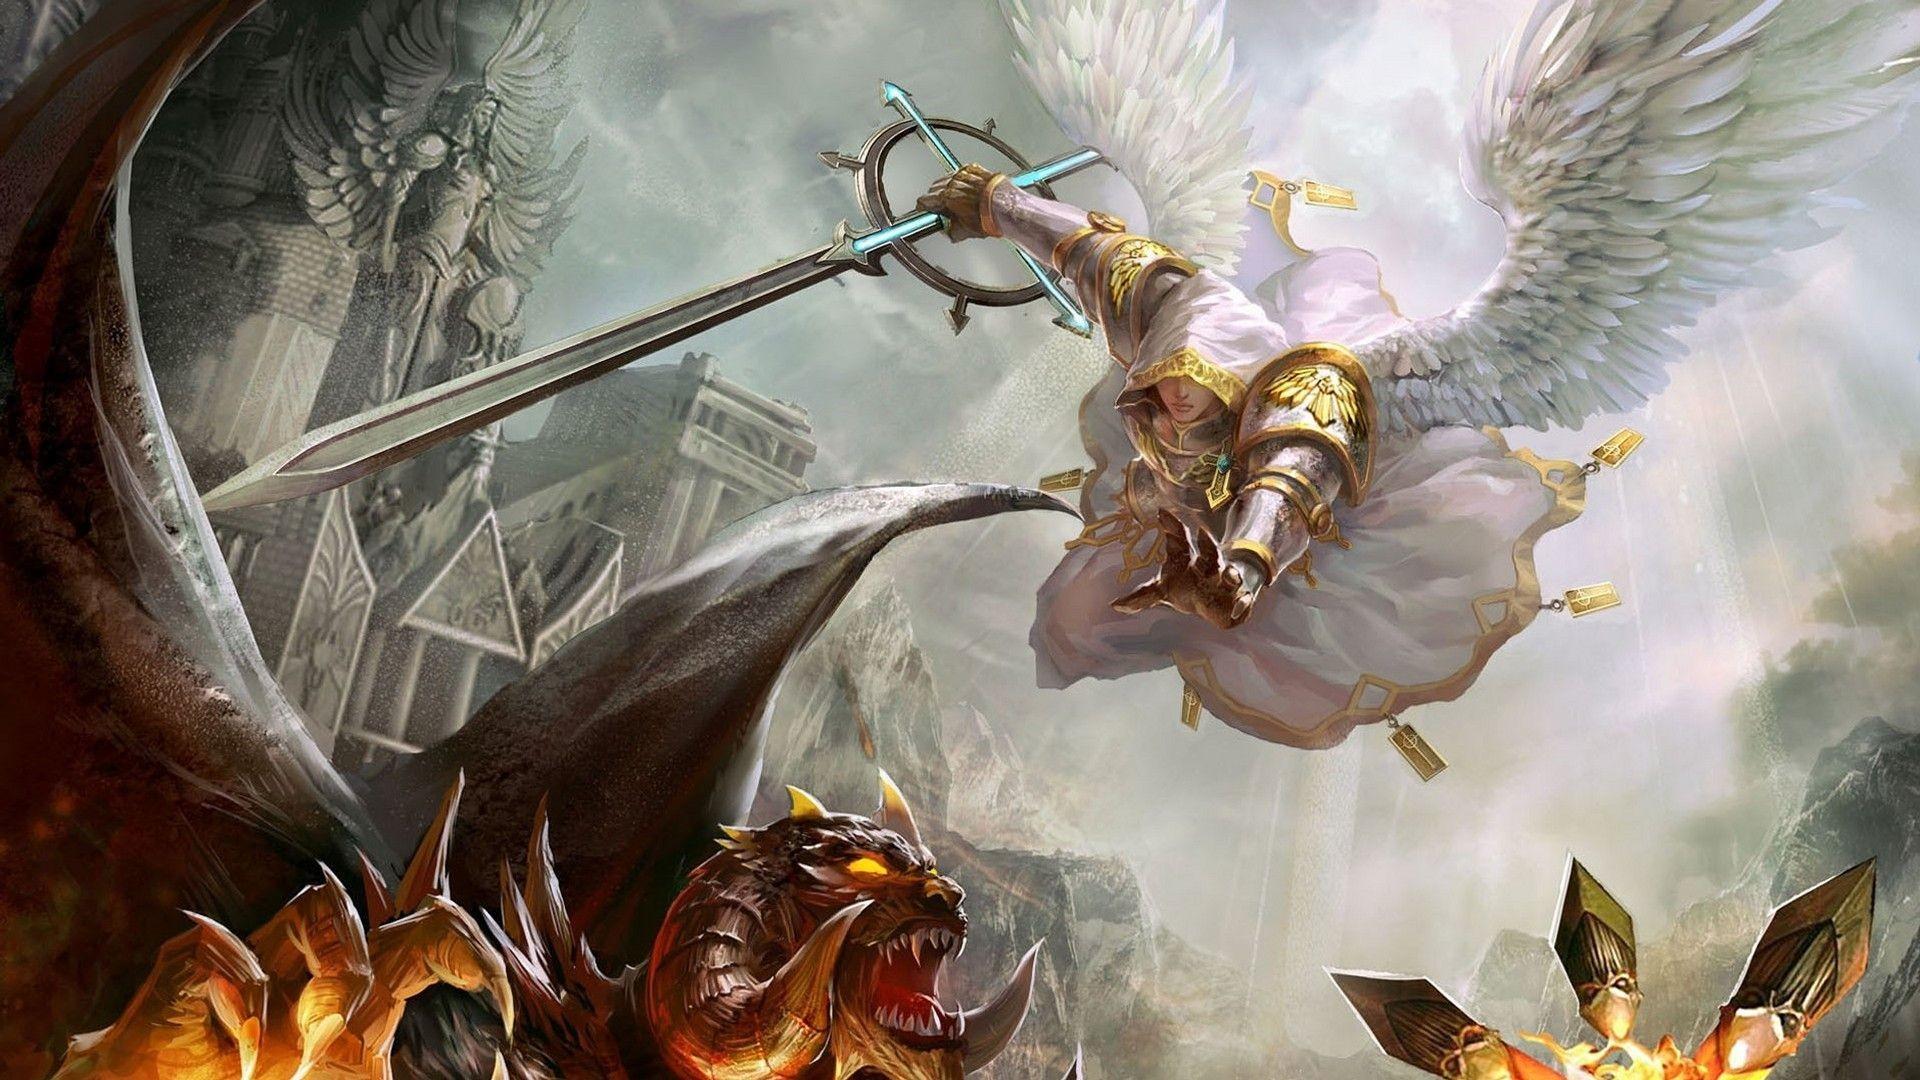 Extra Wallpapers – Angel vs demon